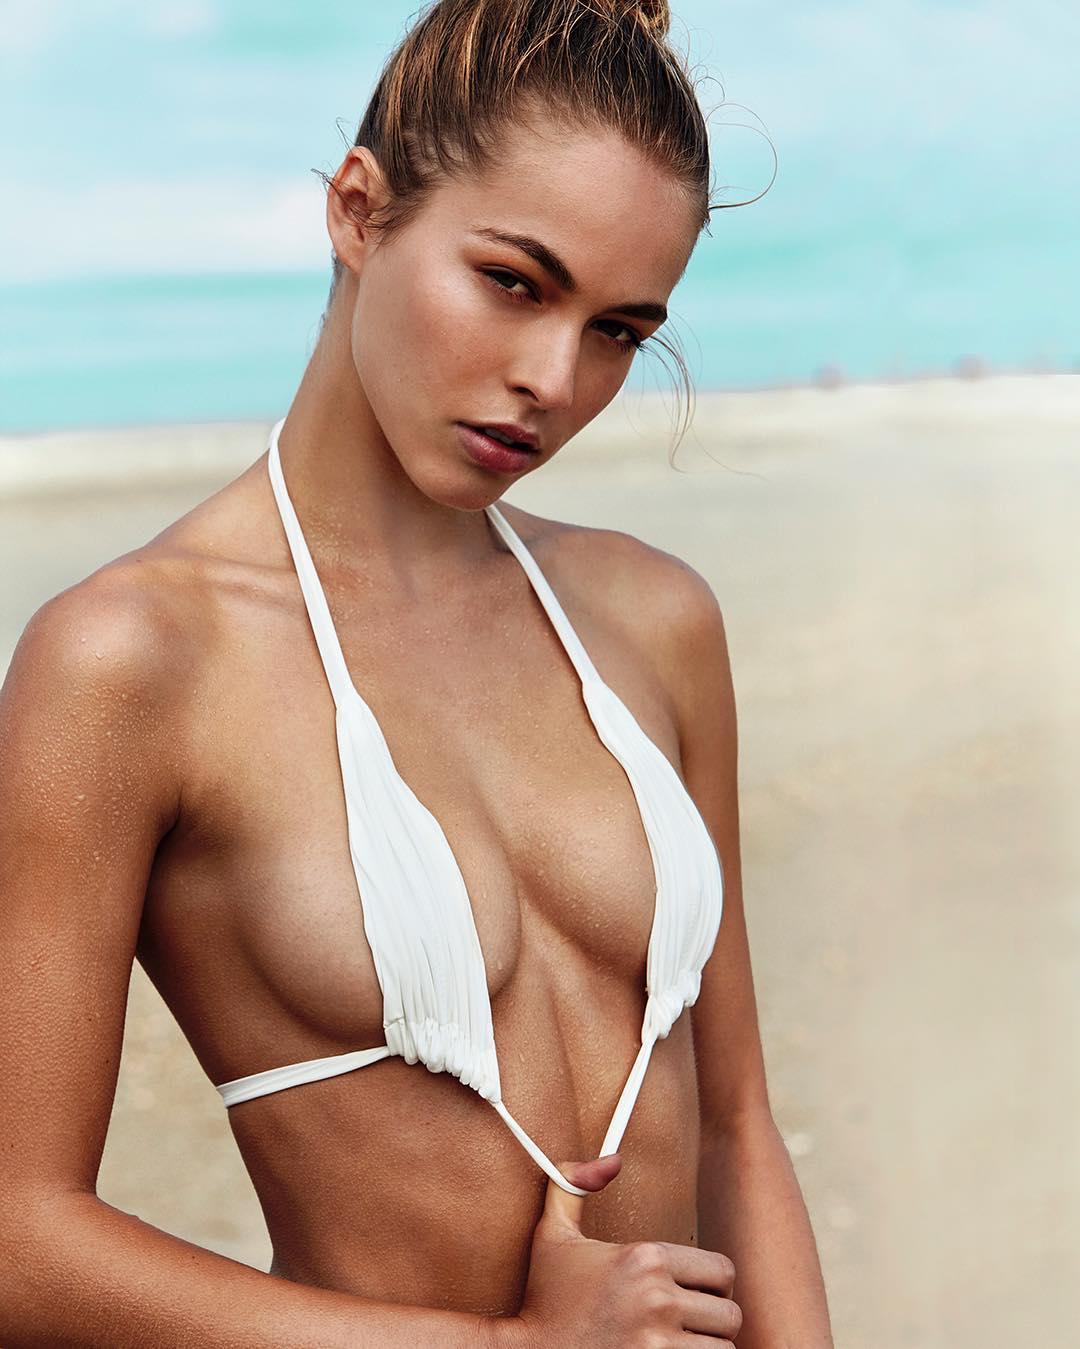 Sexy Caroline Kelley nude (32 photo), Ass, Paparazzi, Selfie, cameltoe 2015